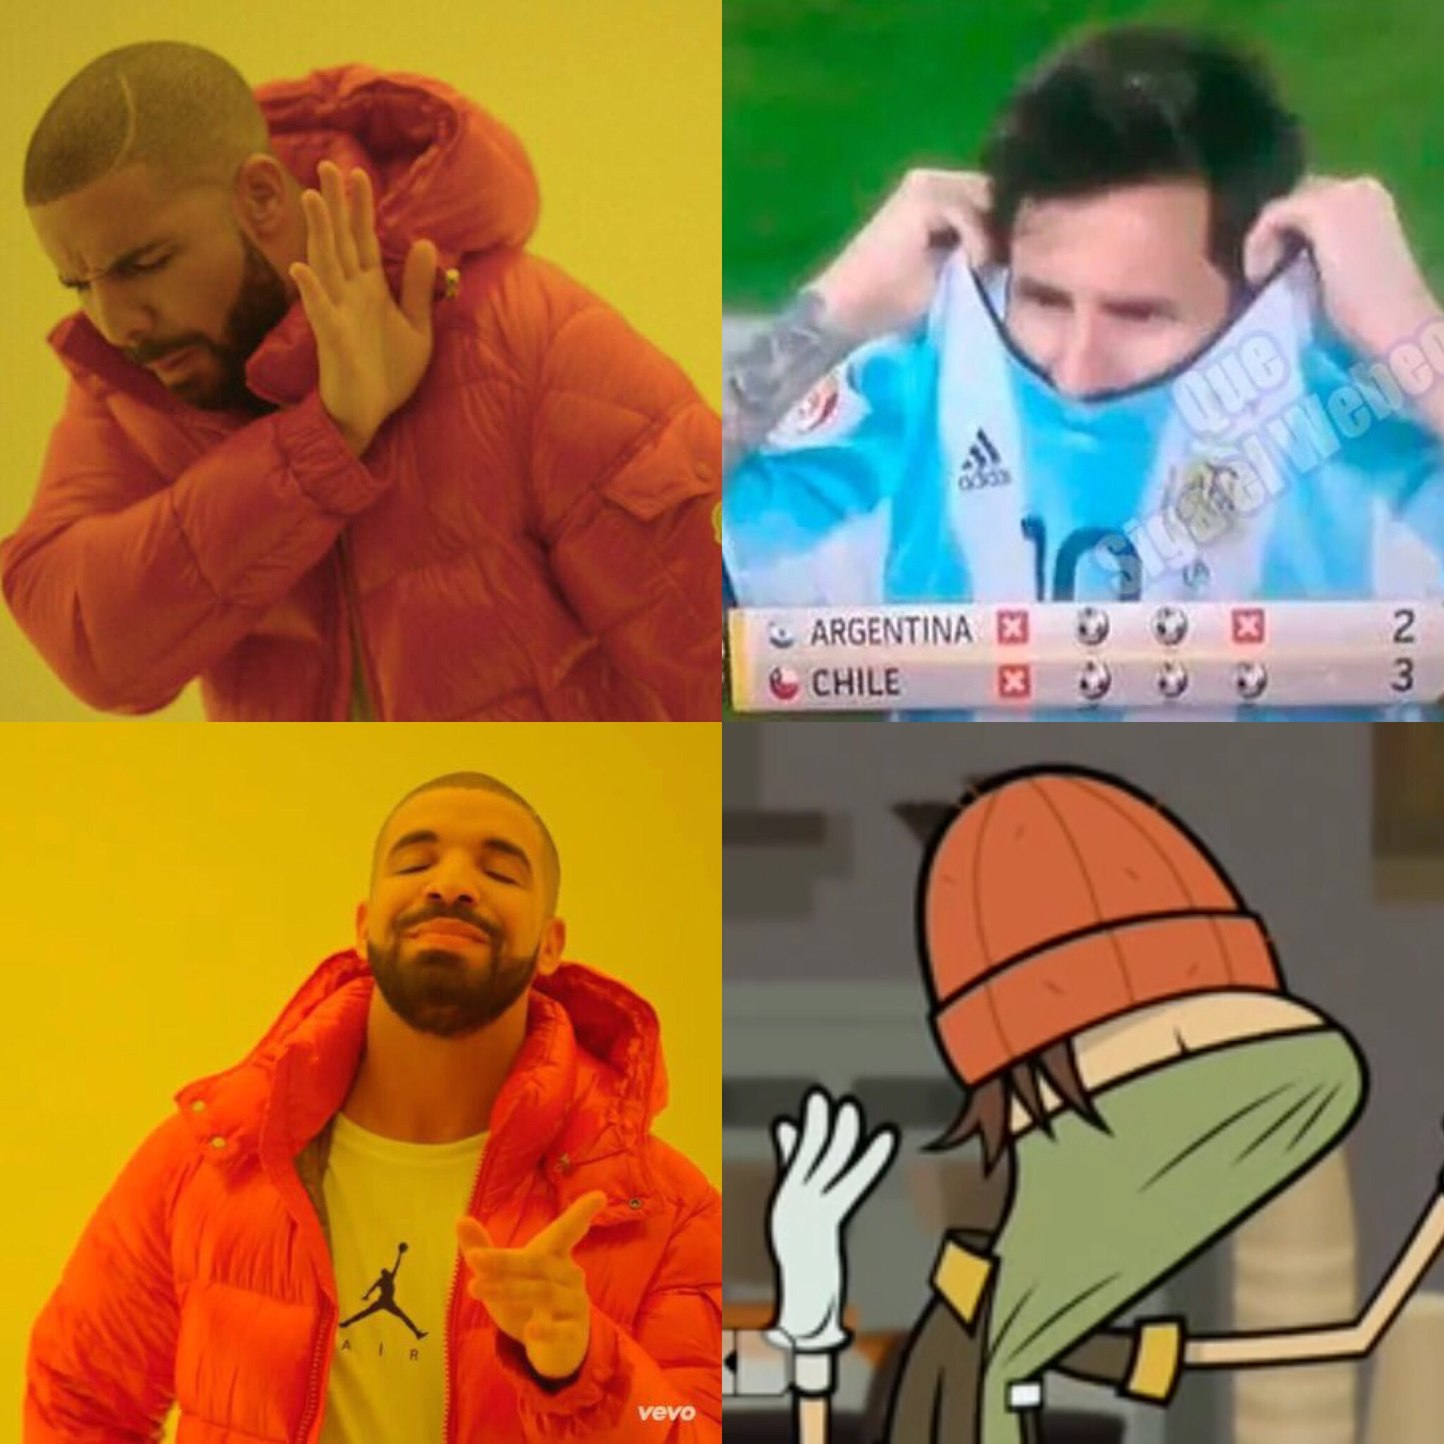 ese wade - meme